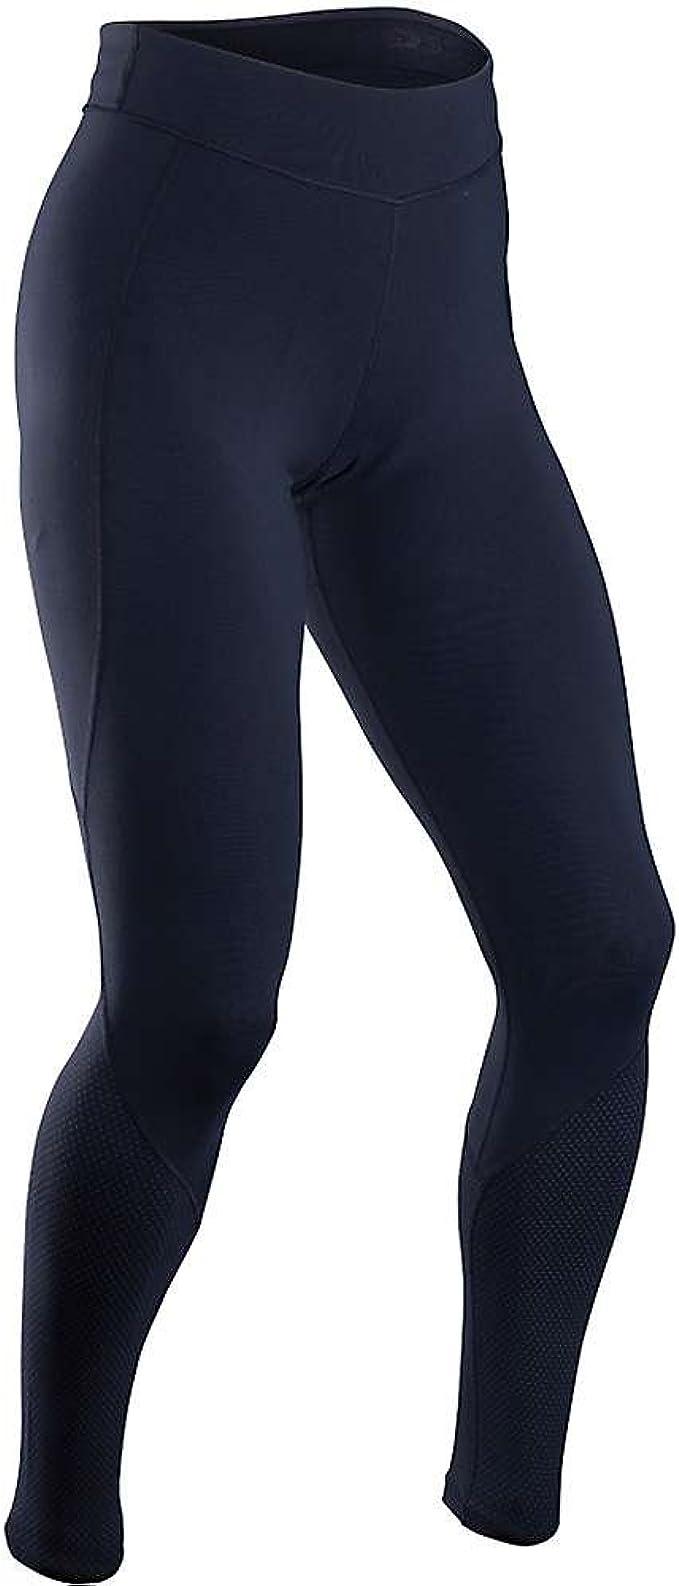 SUGOi Womens Ignite Tight Pants X-Large